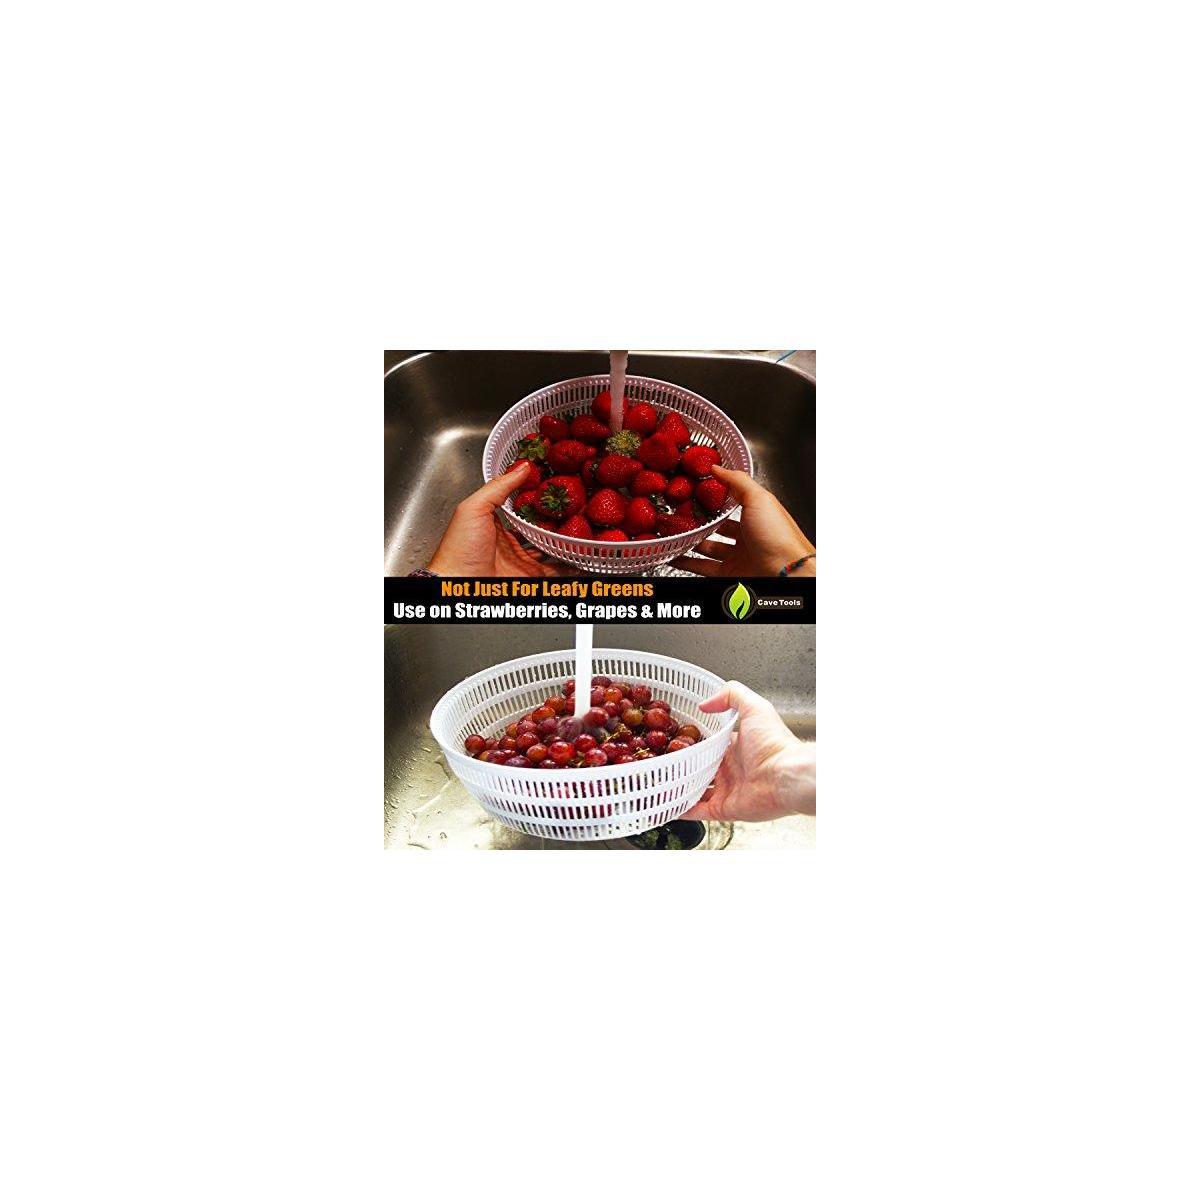 Salad Spinner Large 4.2 Quarts Serving Bowl Set - QUICK DRY DESIGN & DISHWASHER SAFE - BPA Free - No Pump Pull String or Cord Needed, Turn Knob Drys Fruits & Vegetables Fast - Cave Tools